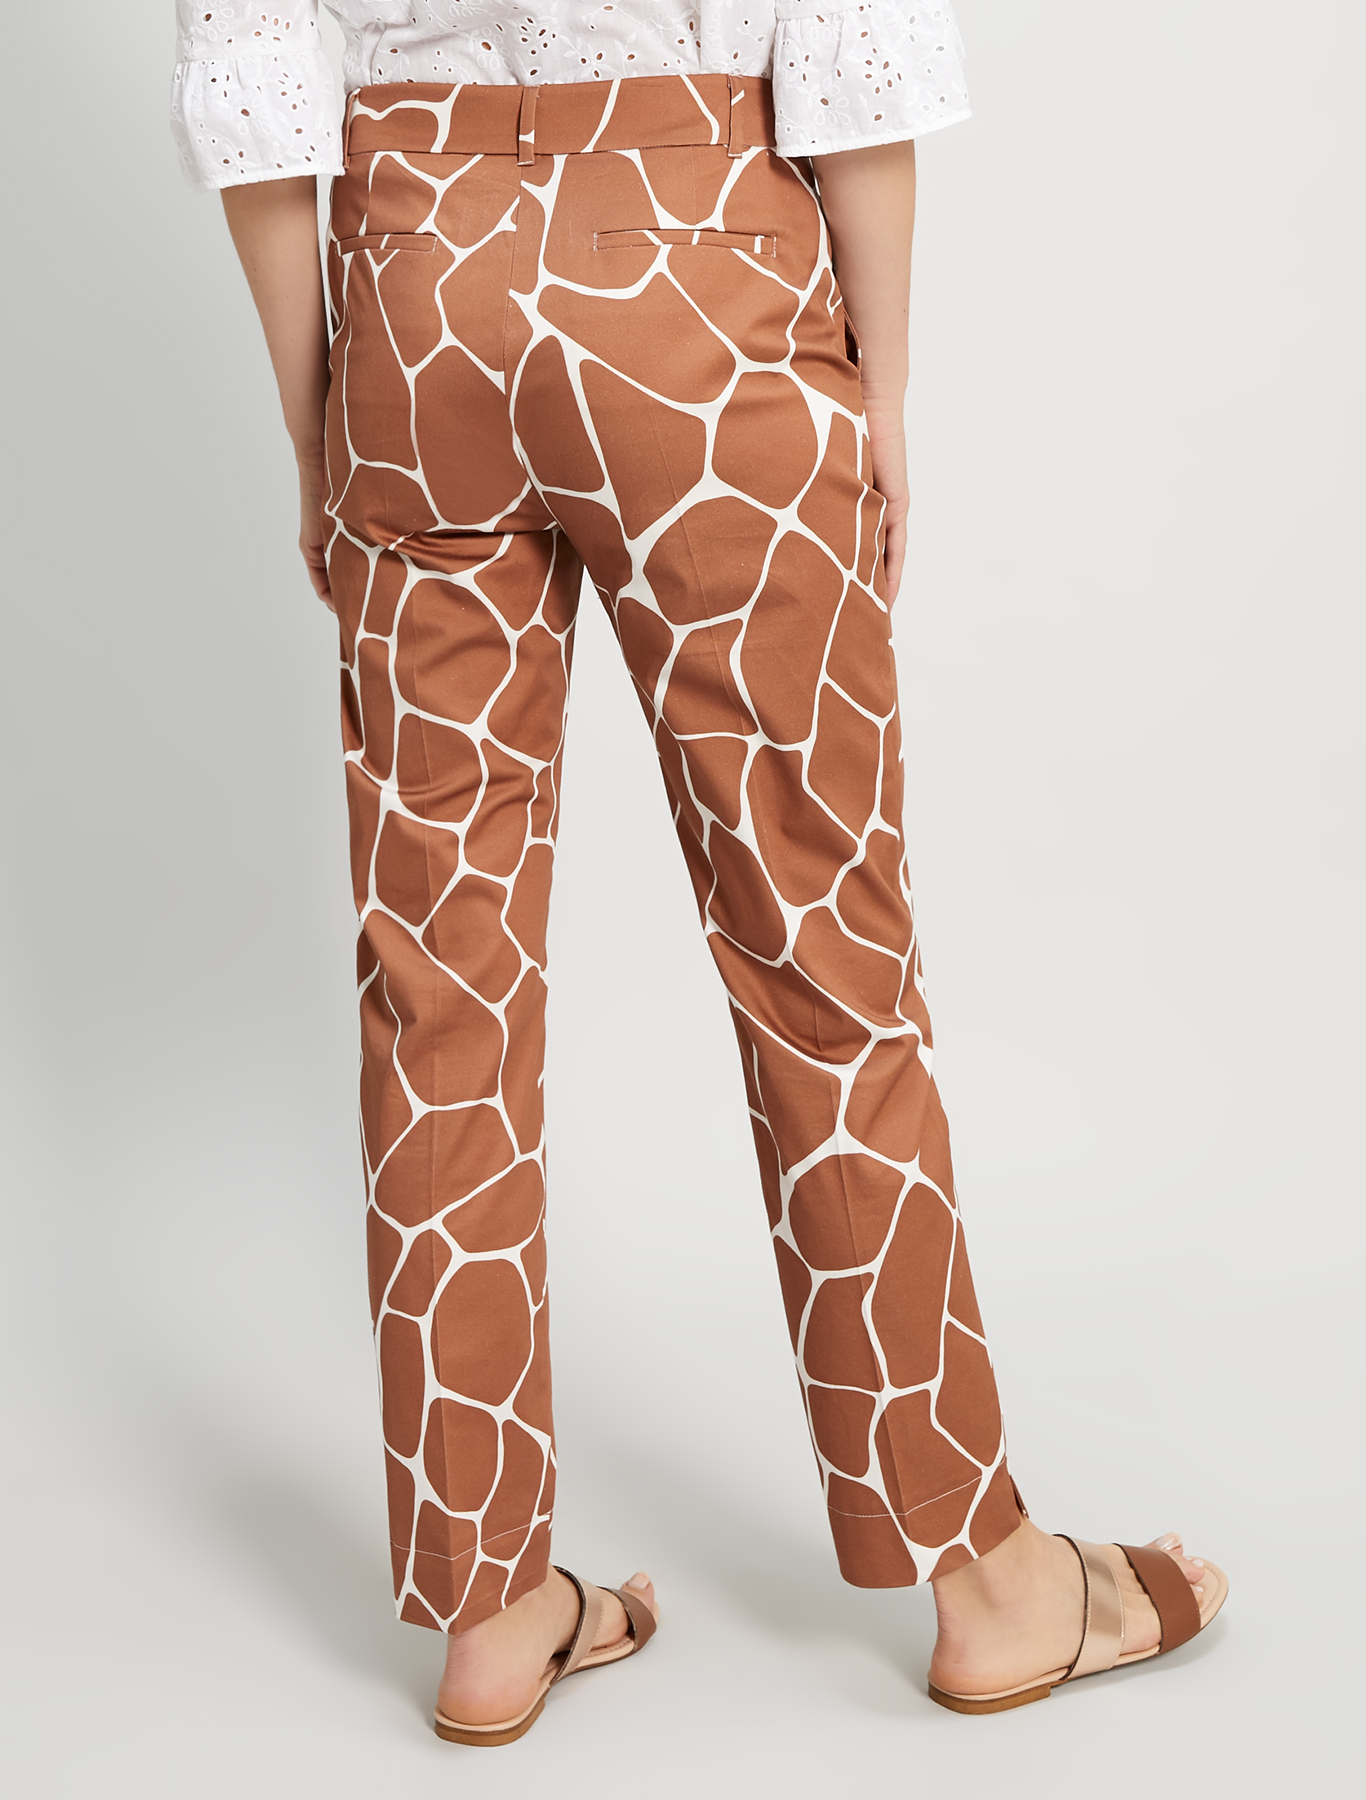 Slim cotton satin trousers - dark brown - pennyblack